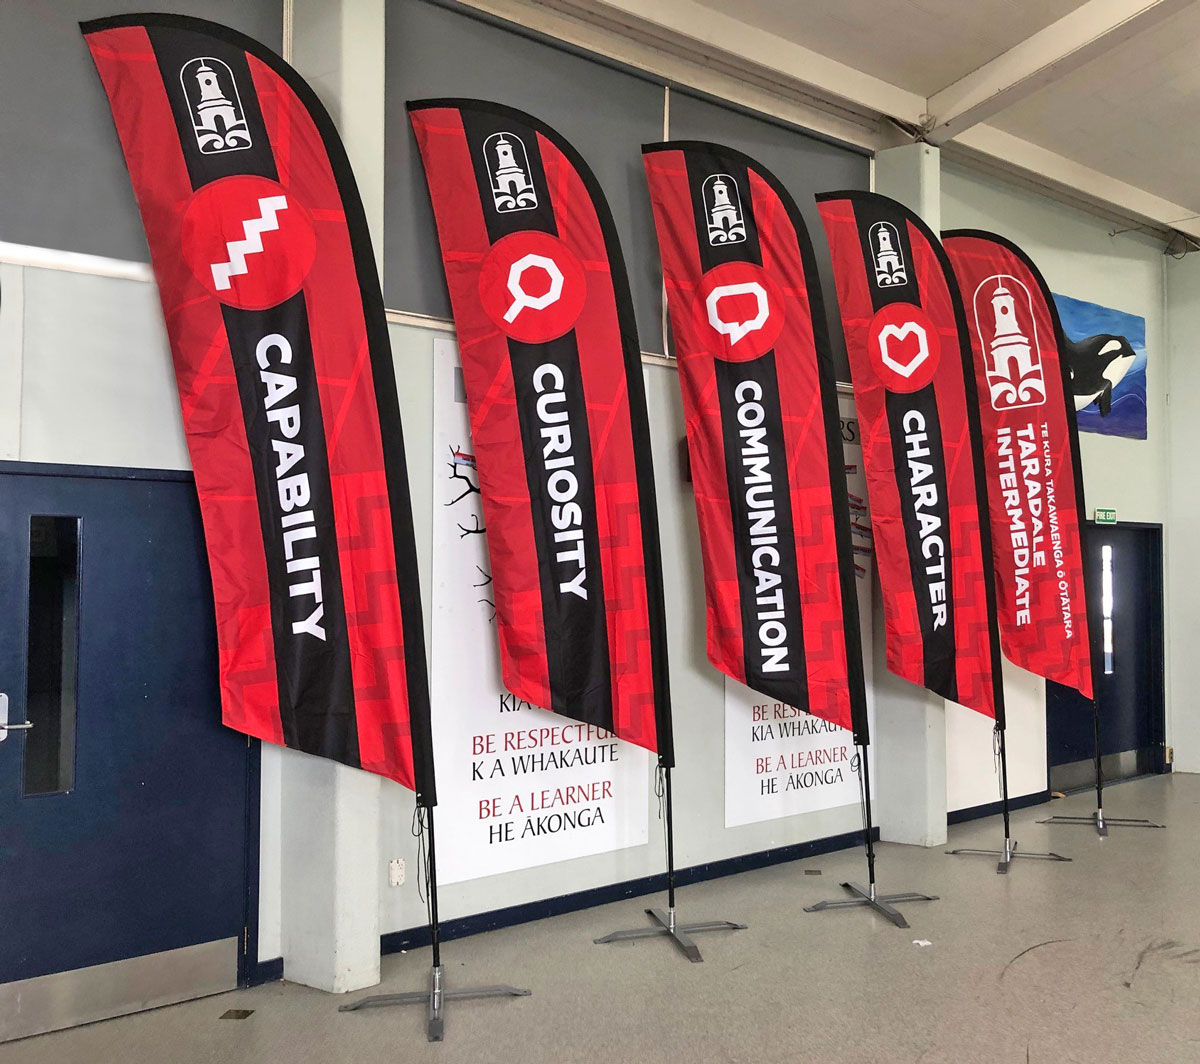 Taradale-Intermediate-Values-flags-Napier-New-Zealand